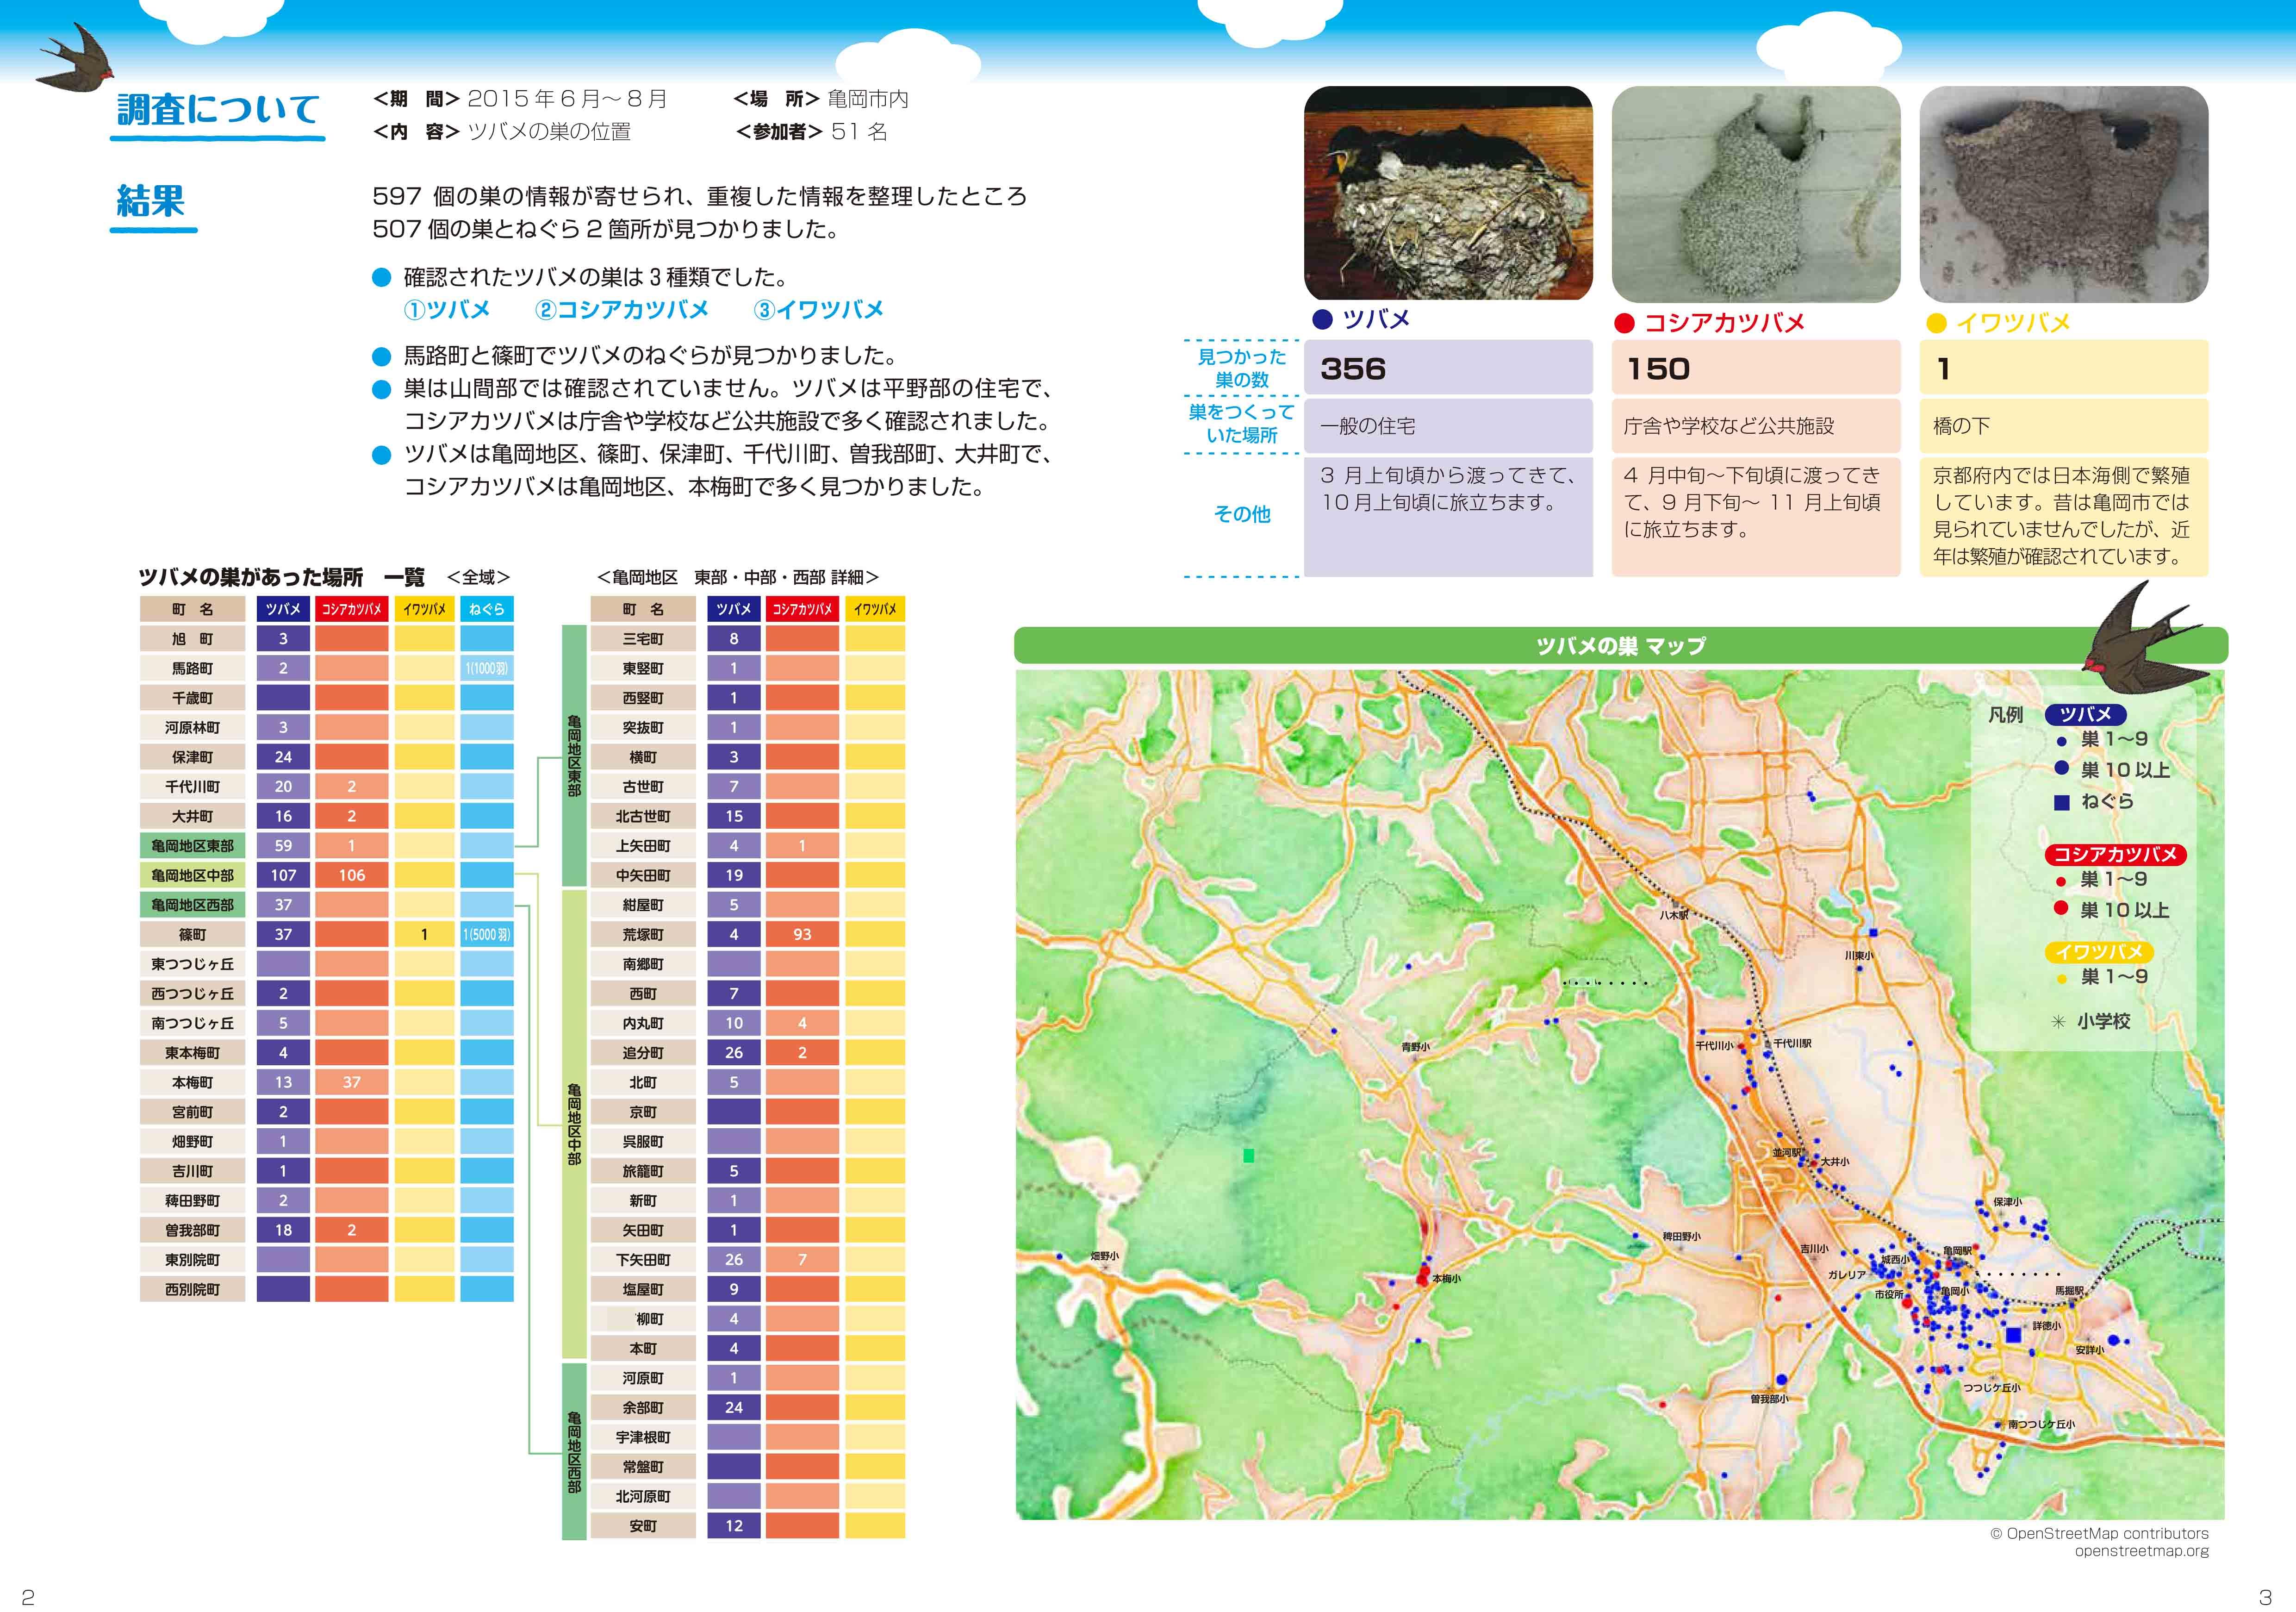 kameoka2015_tsubame01.jpg